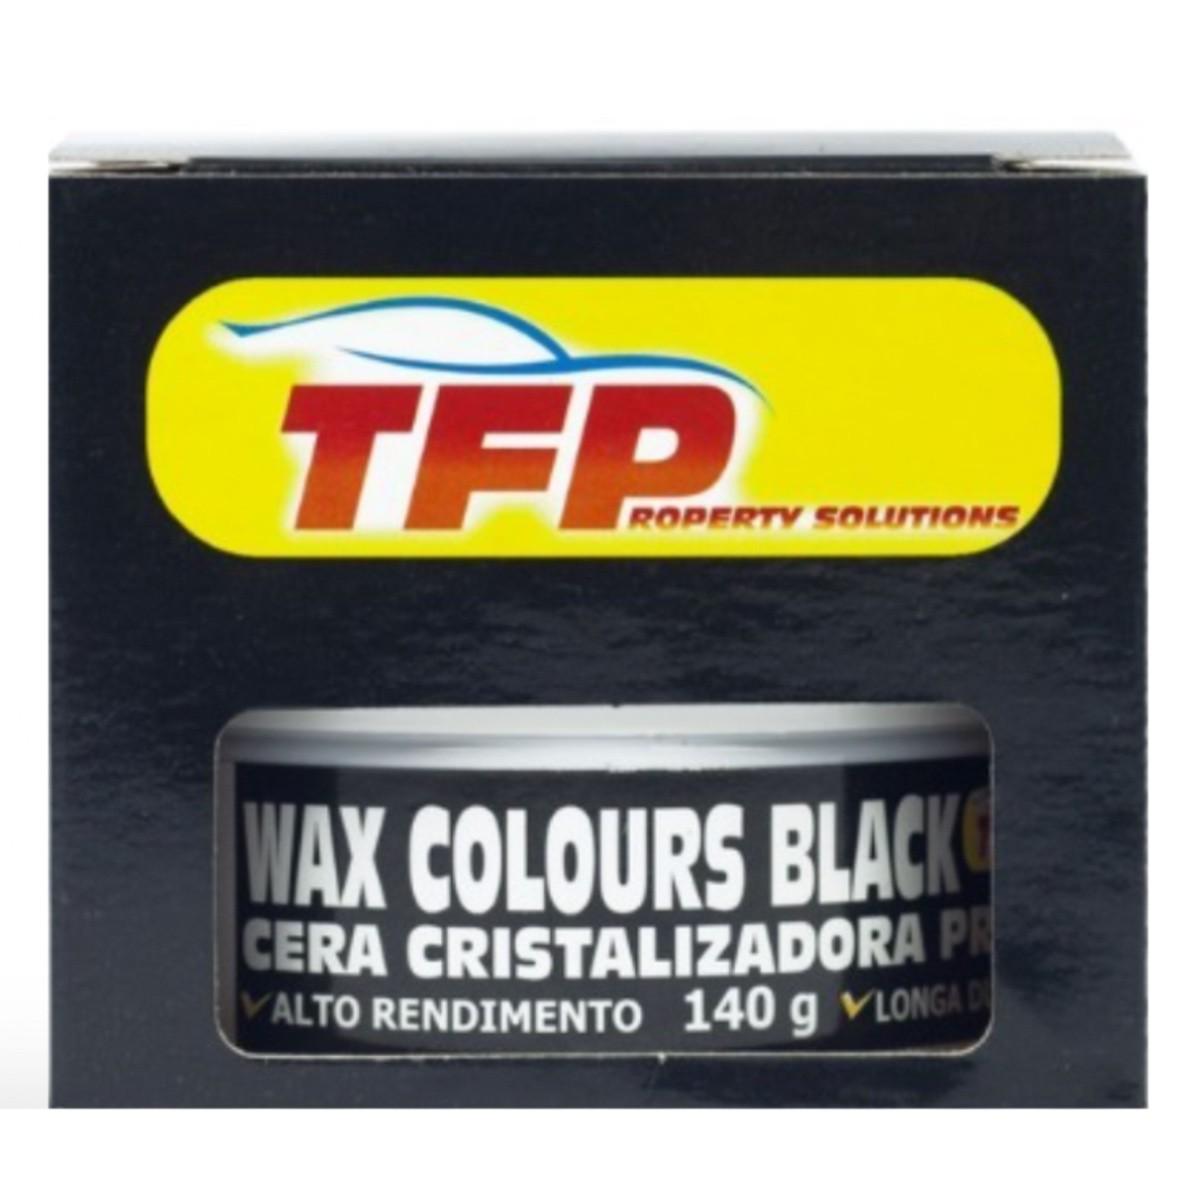 Cera Wax Color Black Cristalizadora 140g Carro Cor Preto + Revitalizador de Plástico